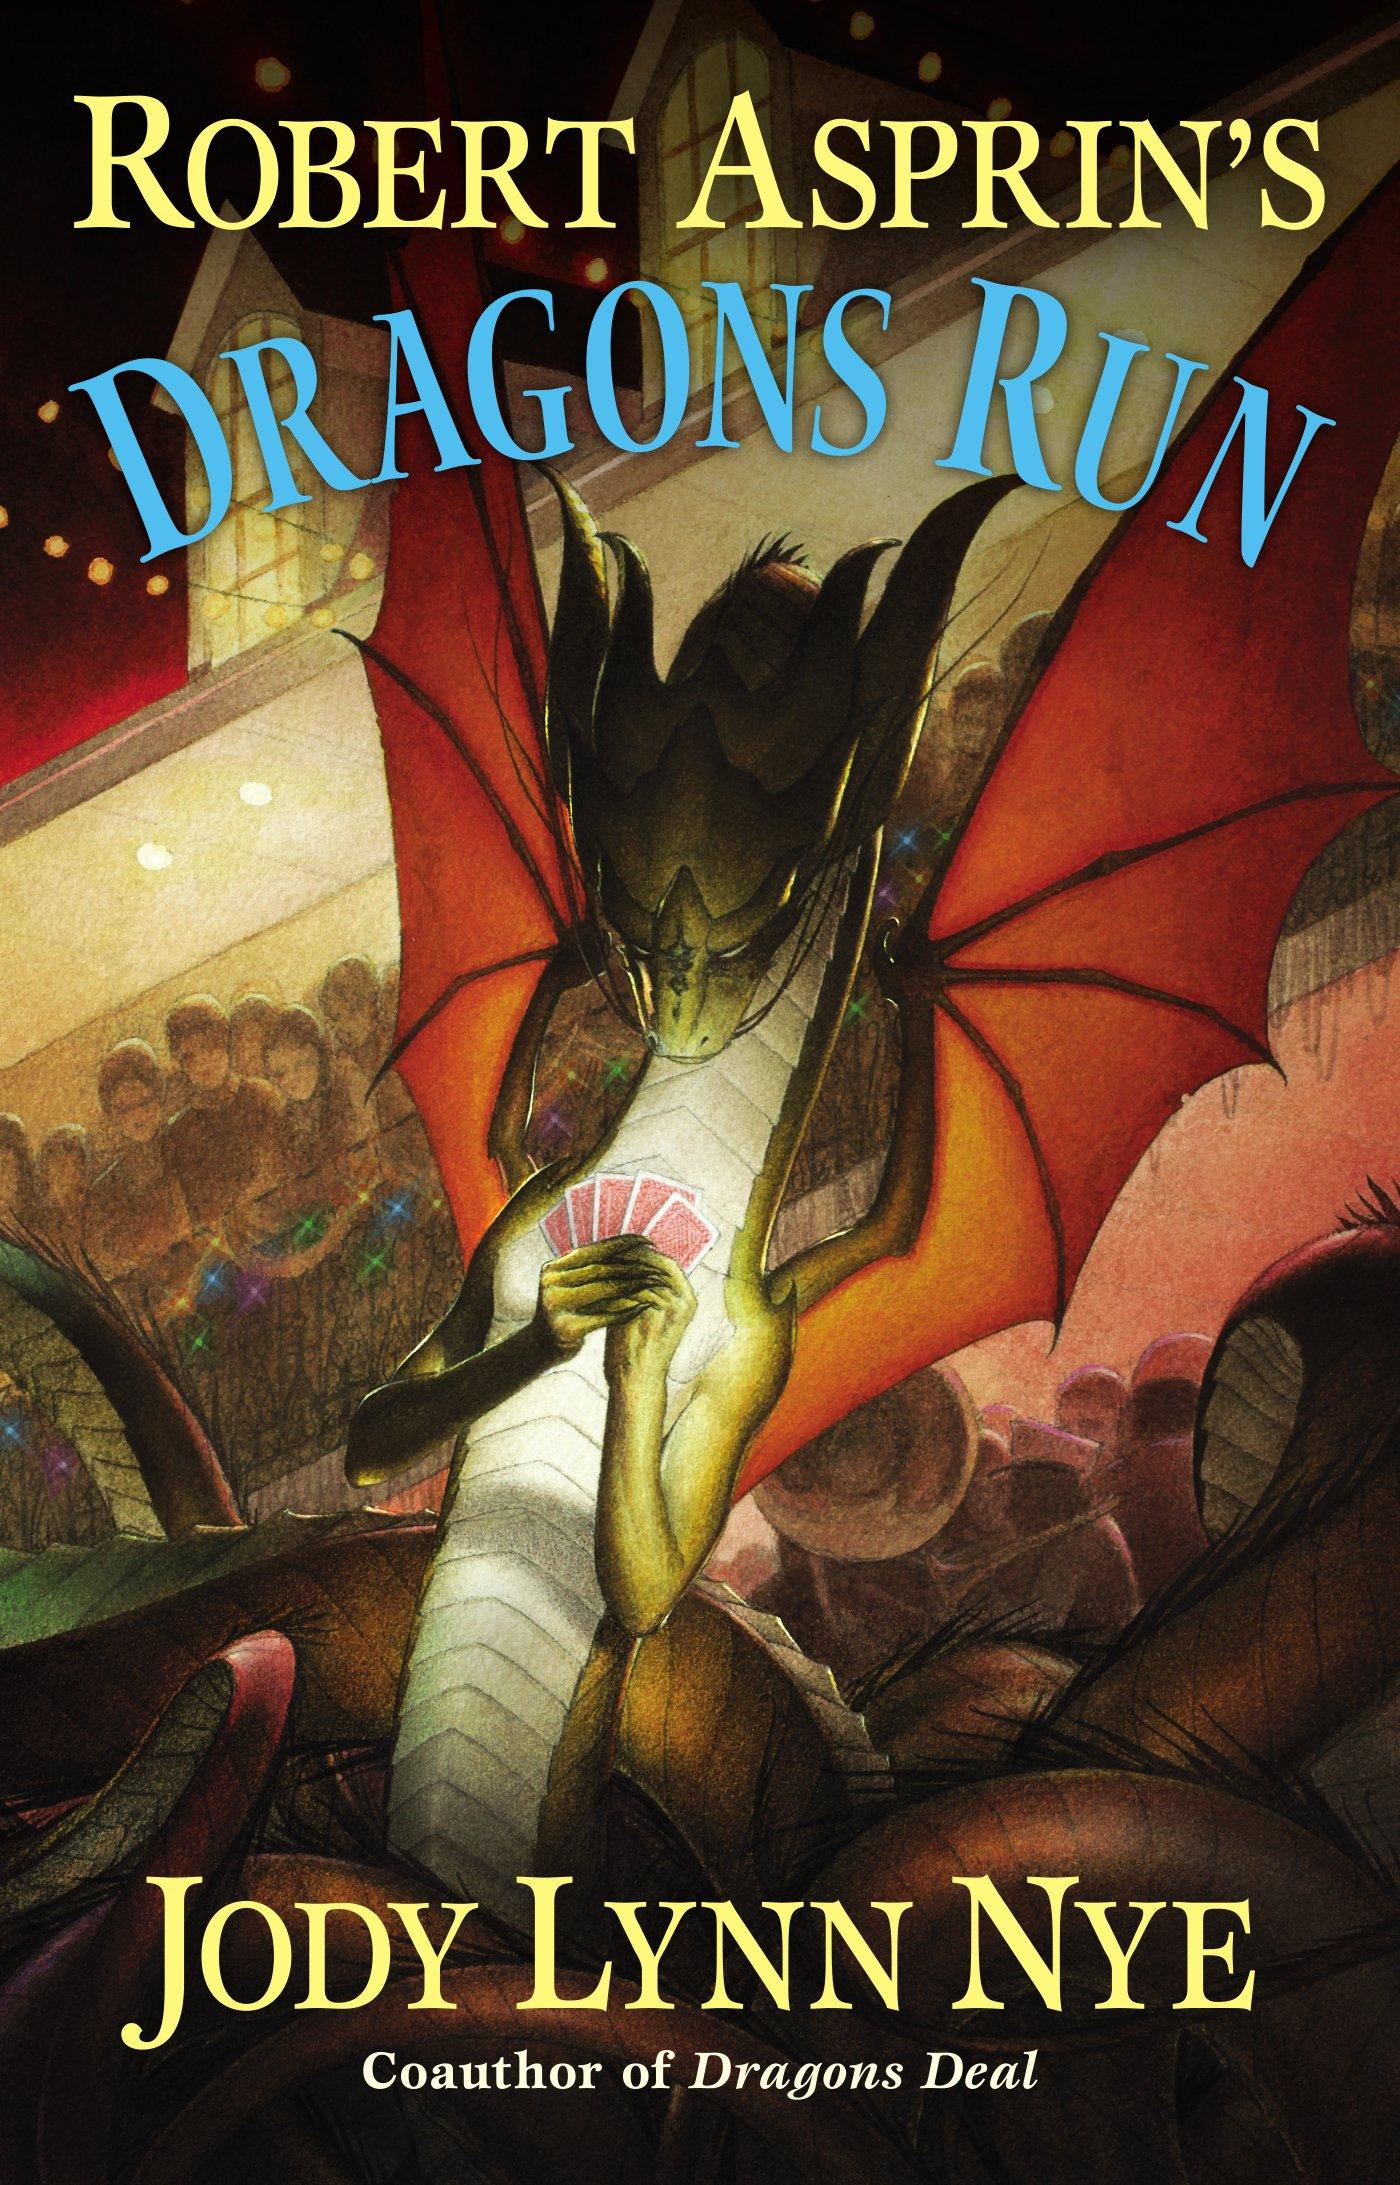 robert asprin s dragons run jody lynn nye 9780425256978 amazon